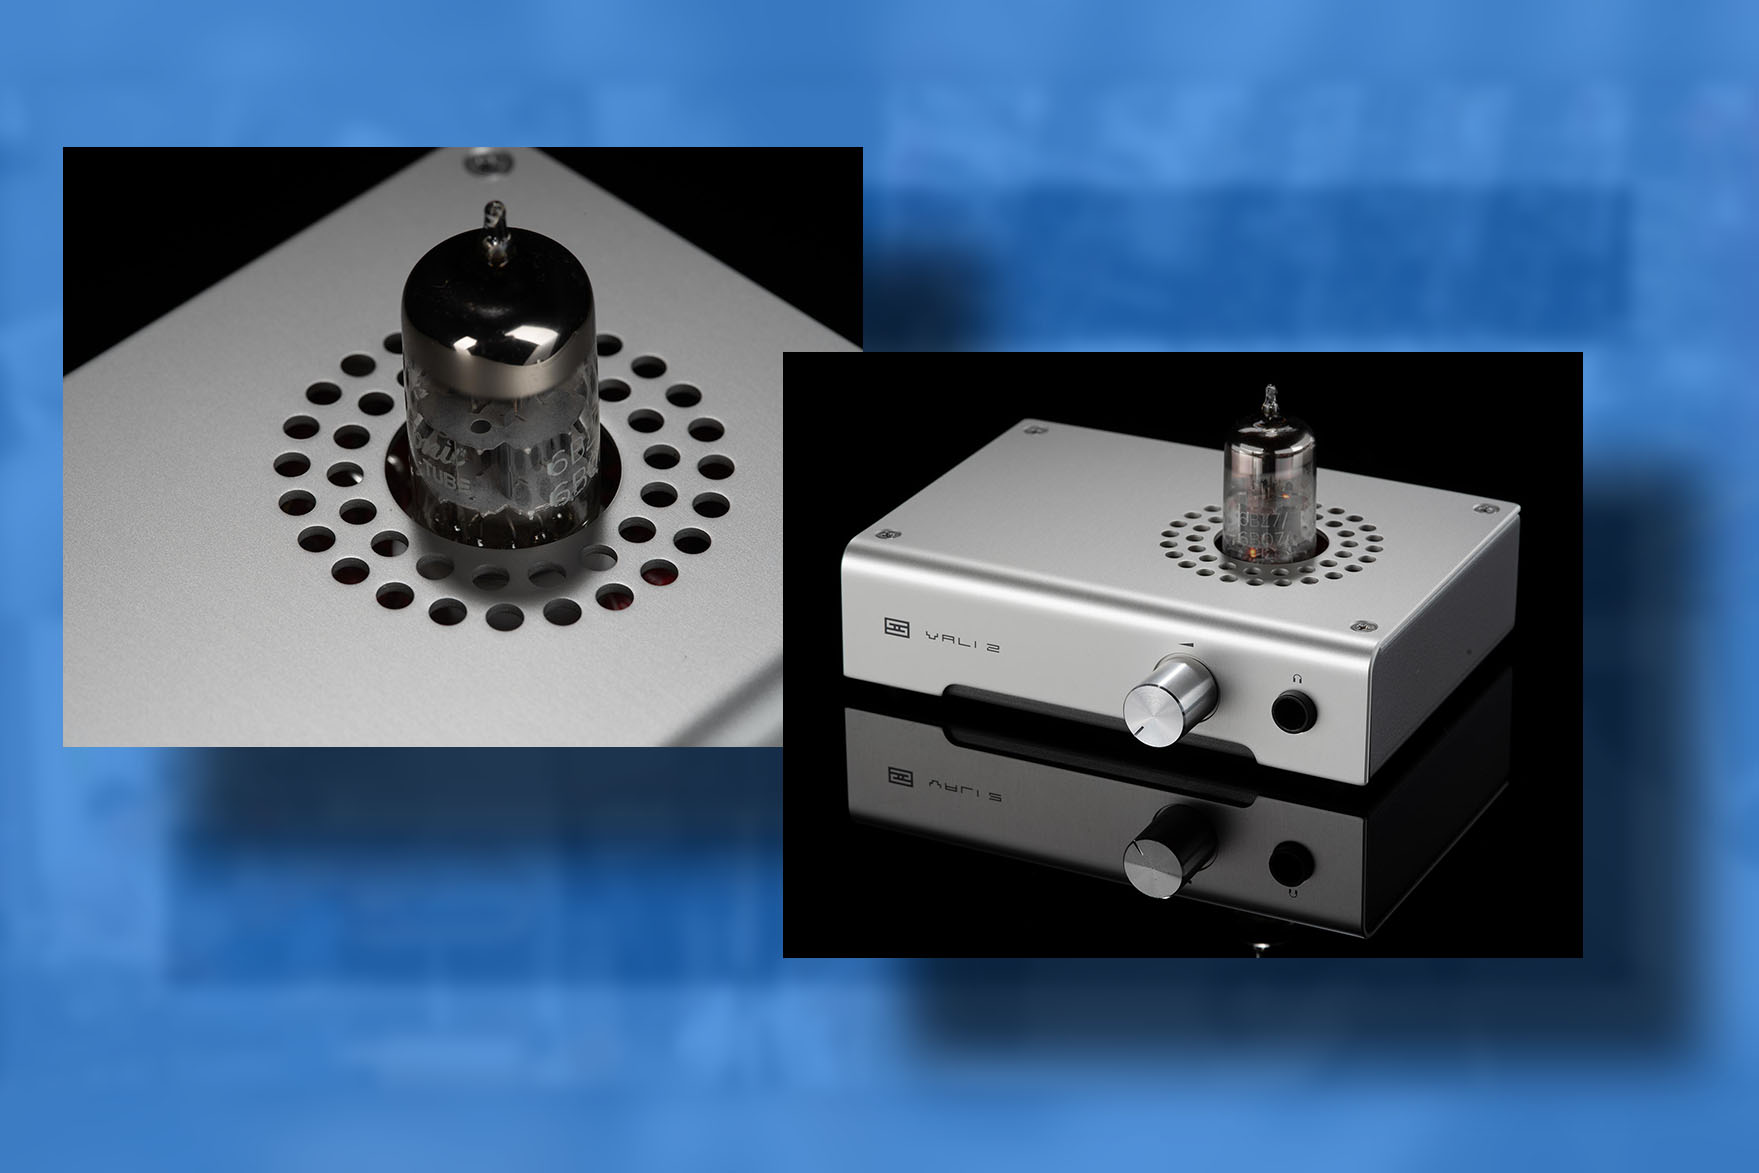 Introducing the Schiit Audio Vali 2+